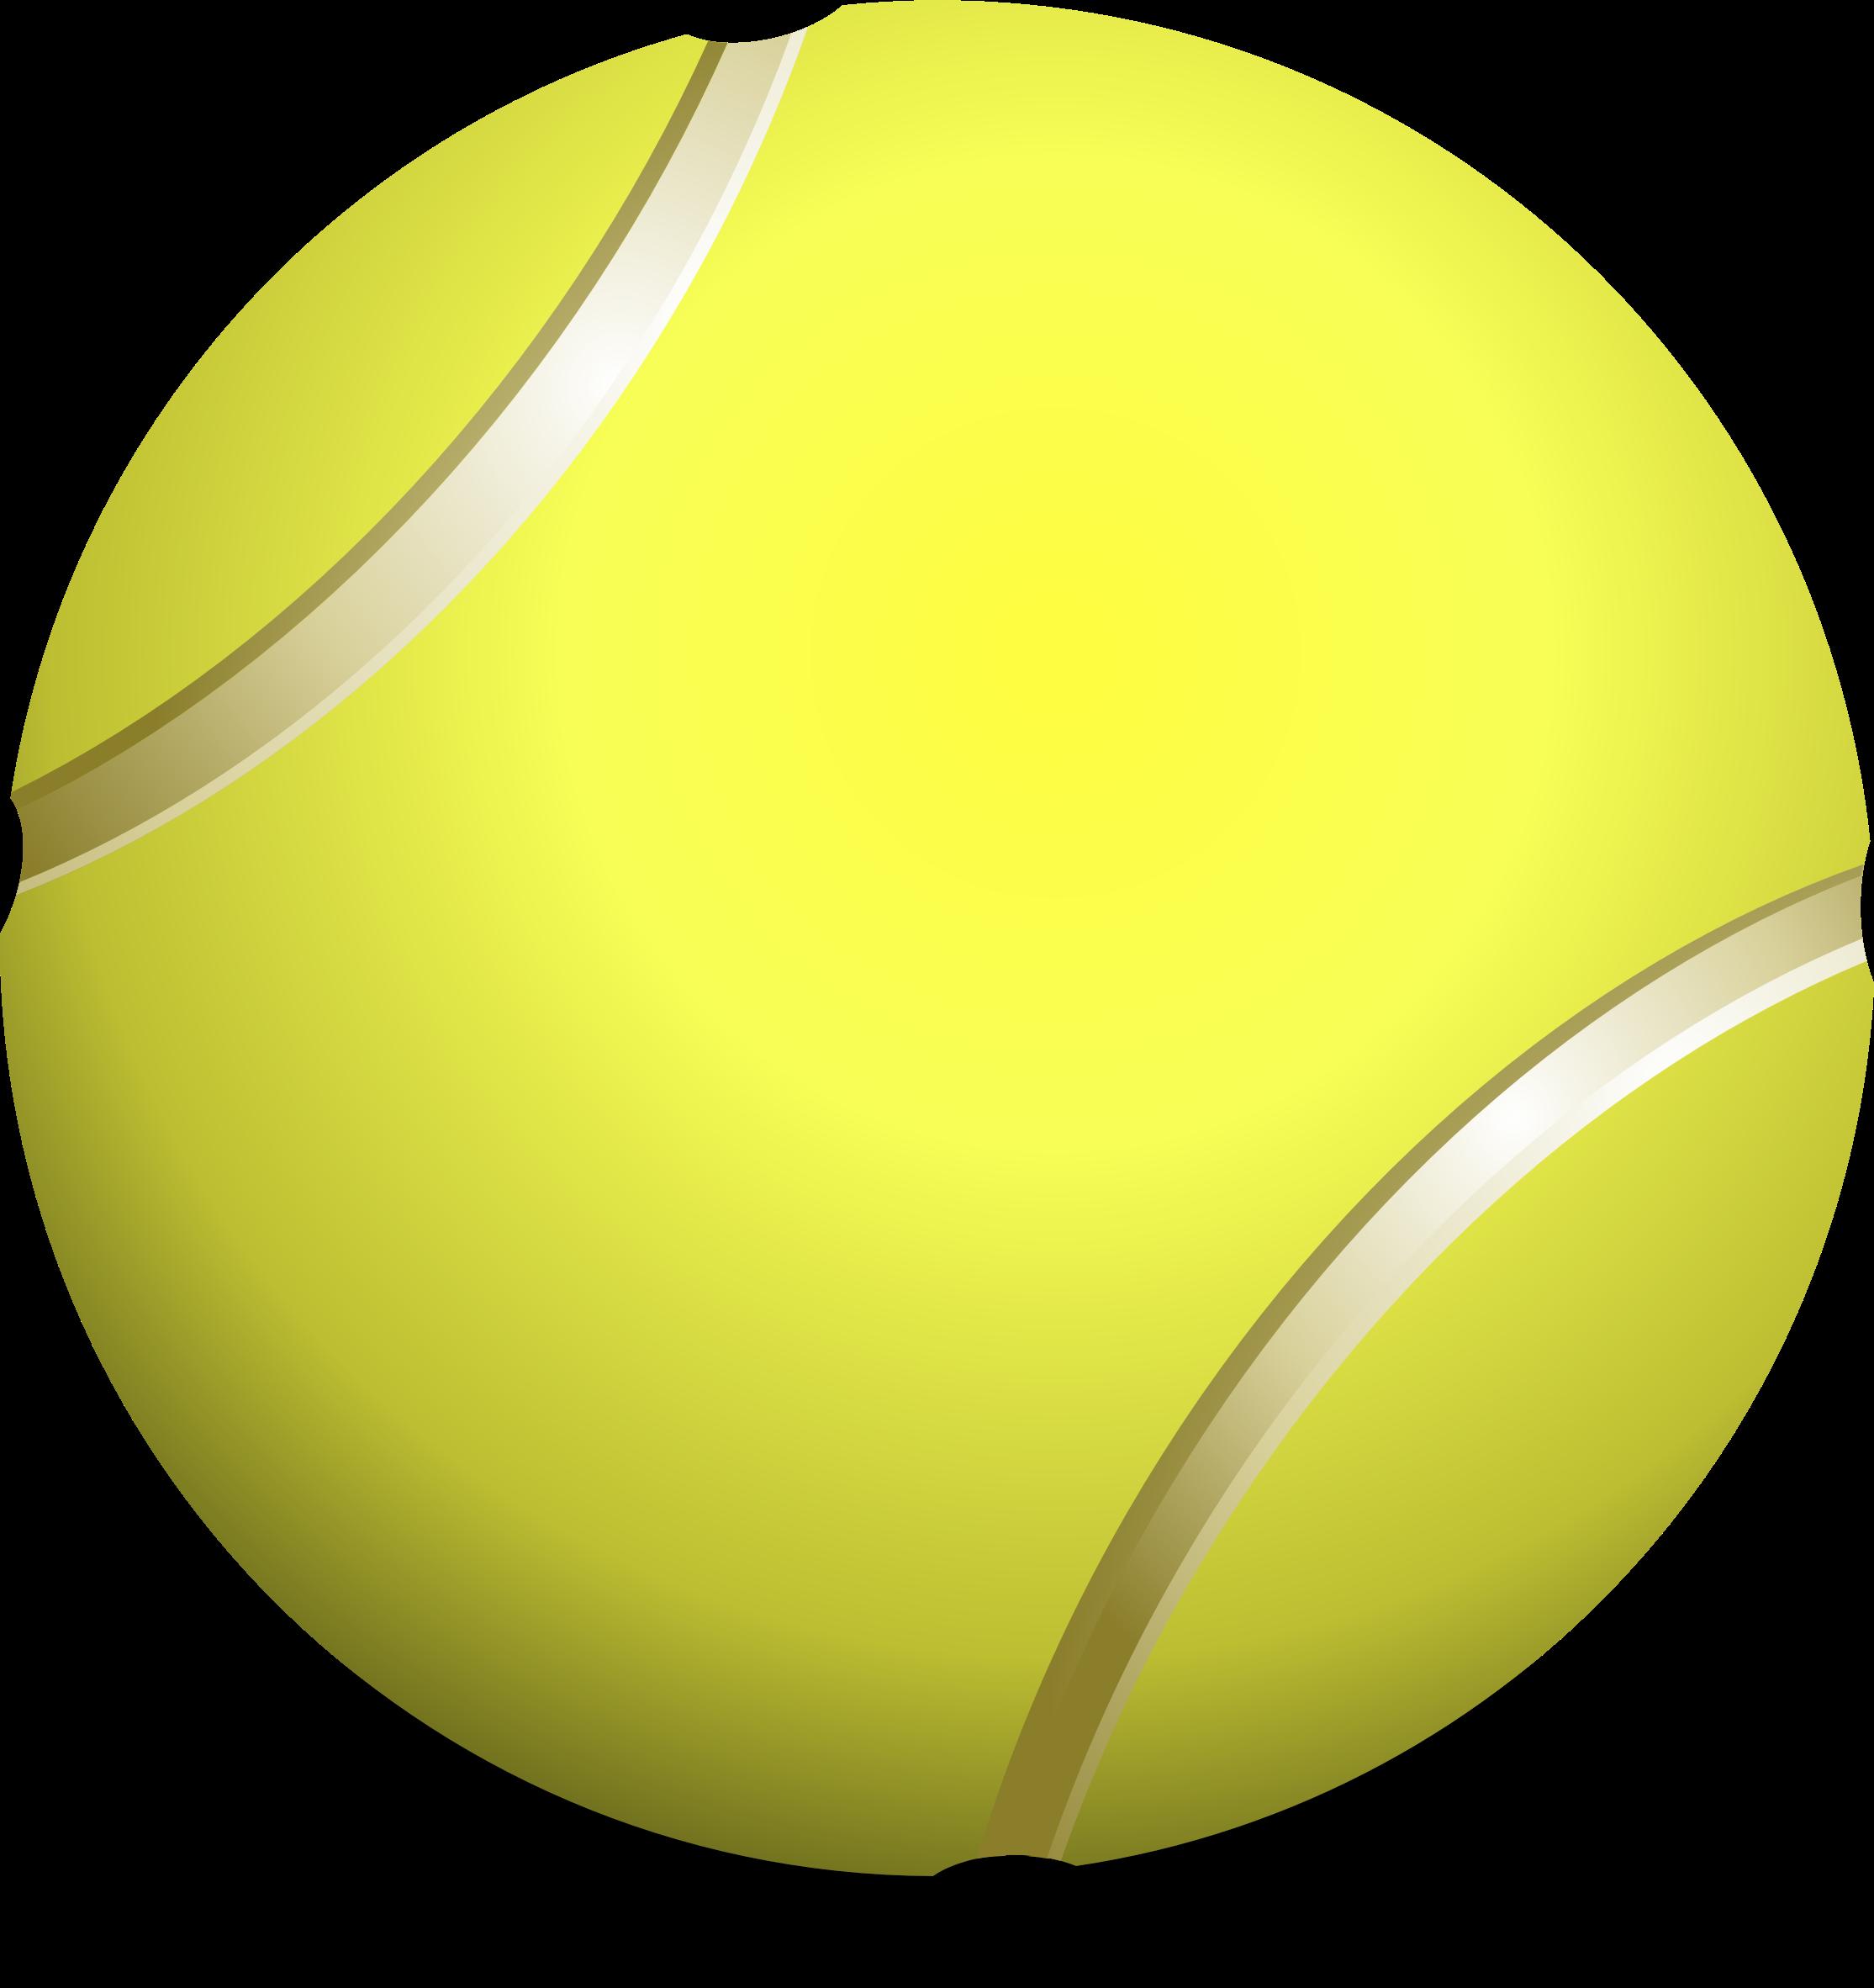 collection of high. Balls clipart tennis ball